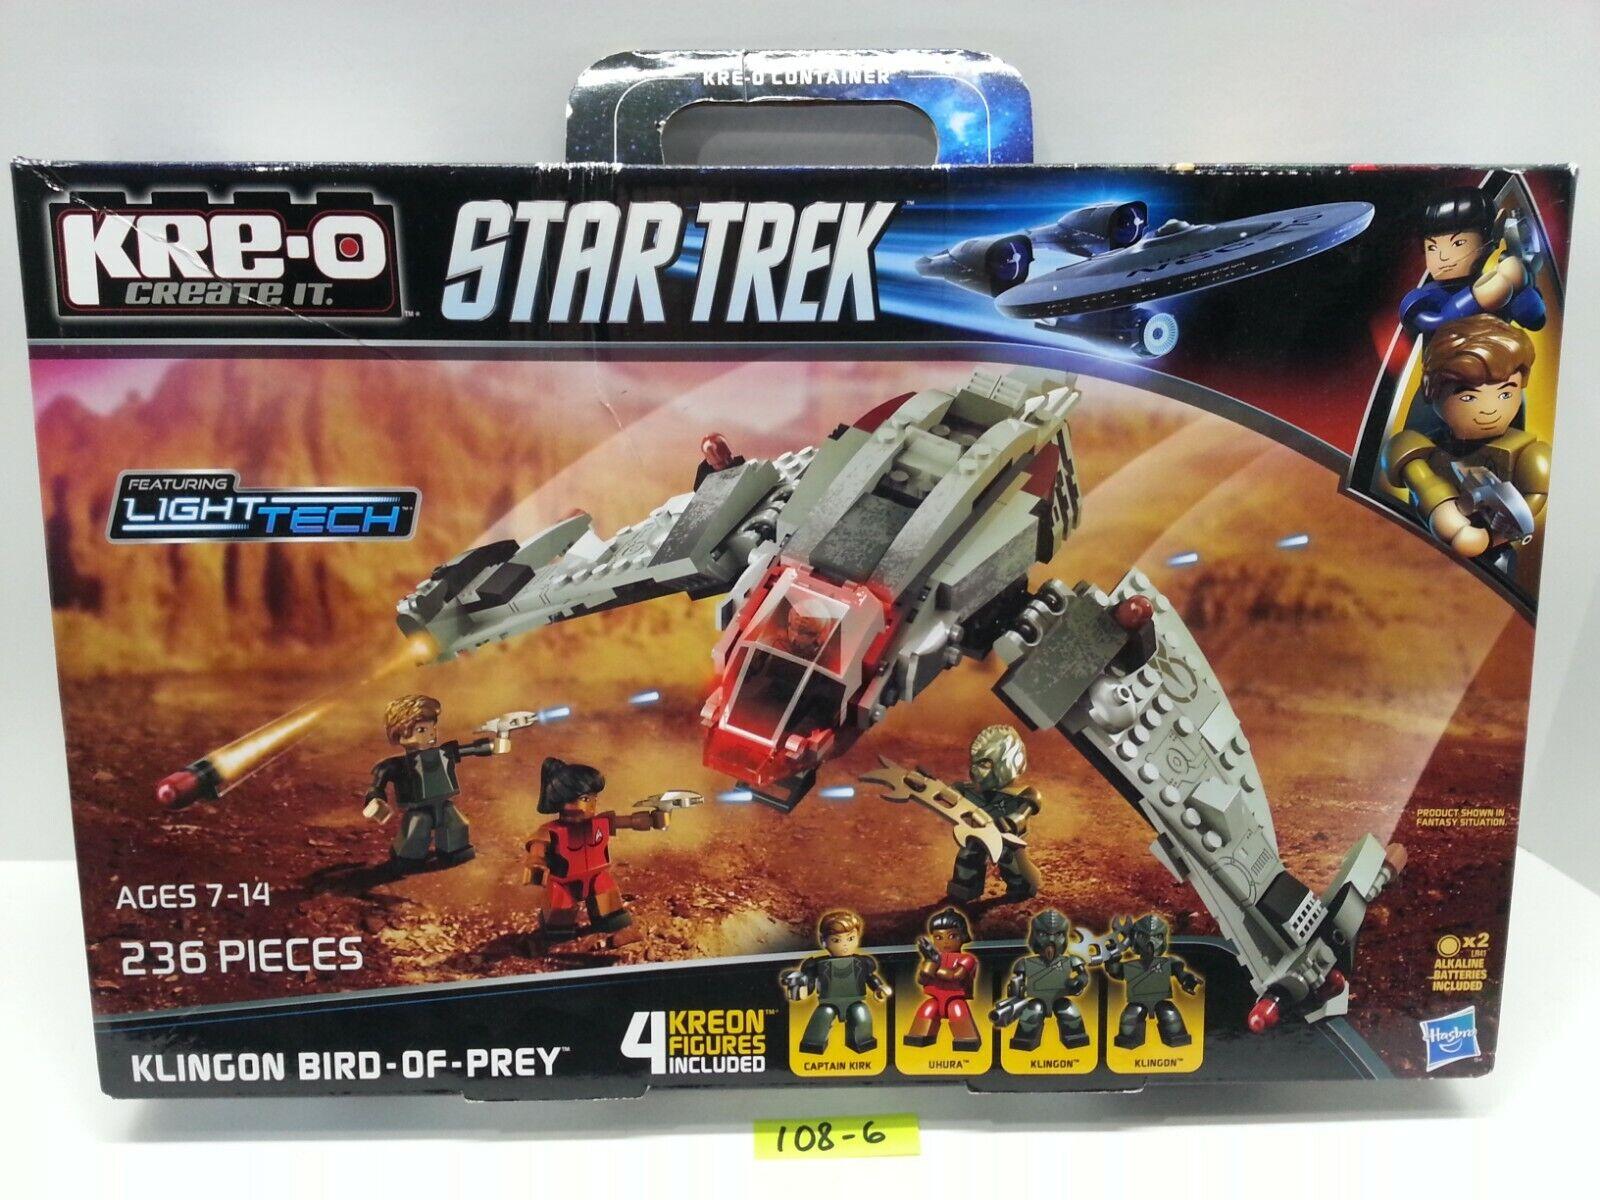 KRE-O Star Trek A3136 Klingon Bird of Prey Vehicle Construction Set NEW & SEALED